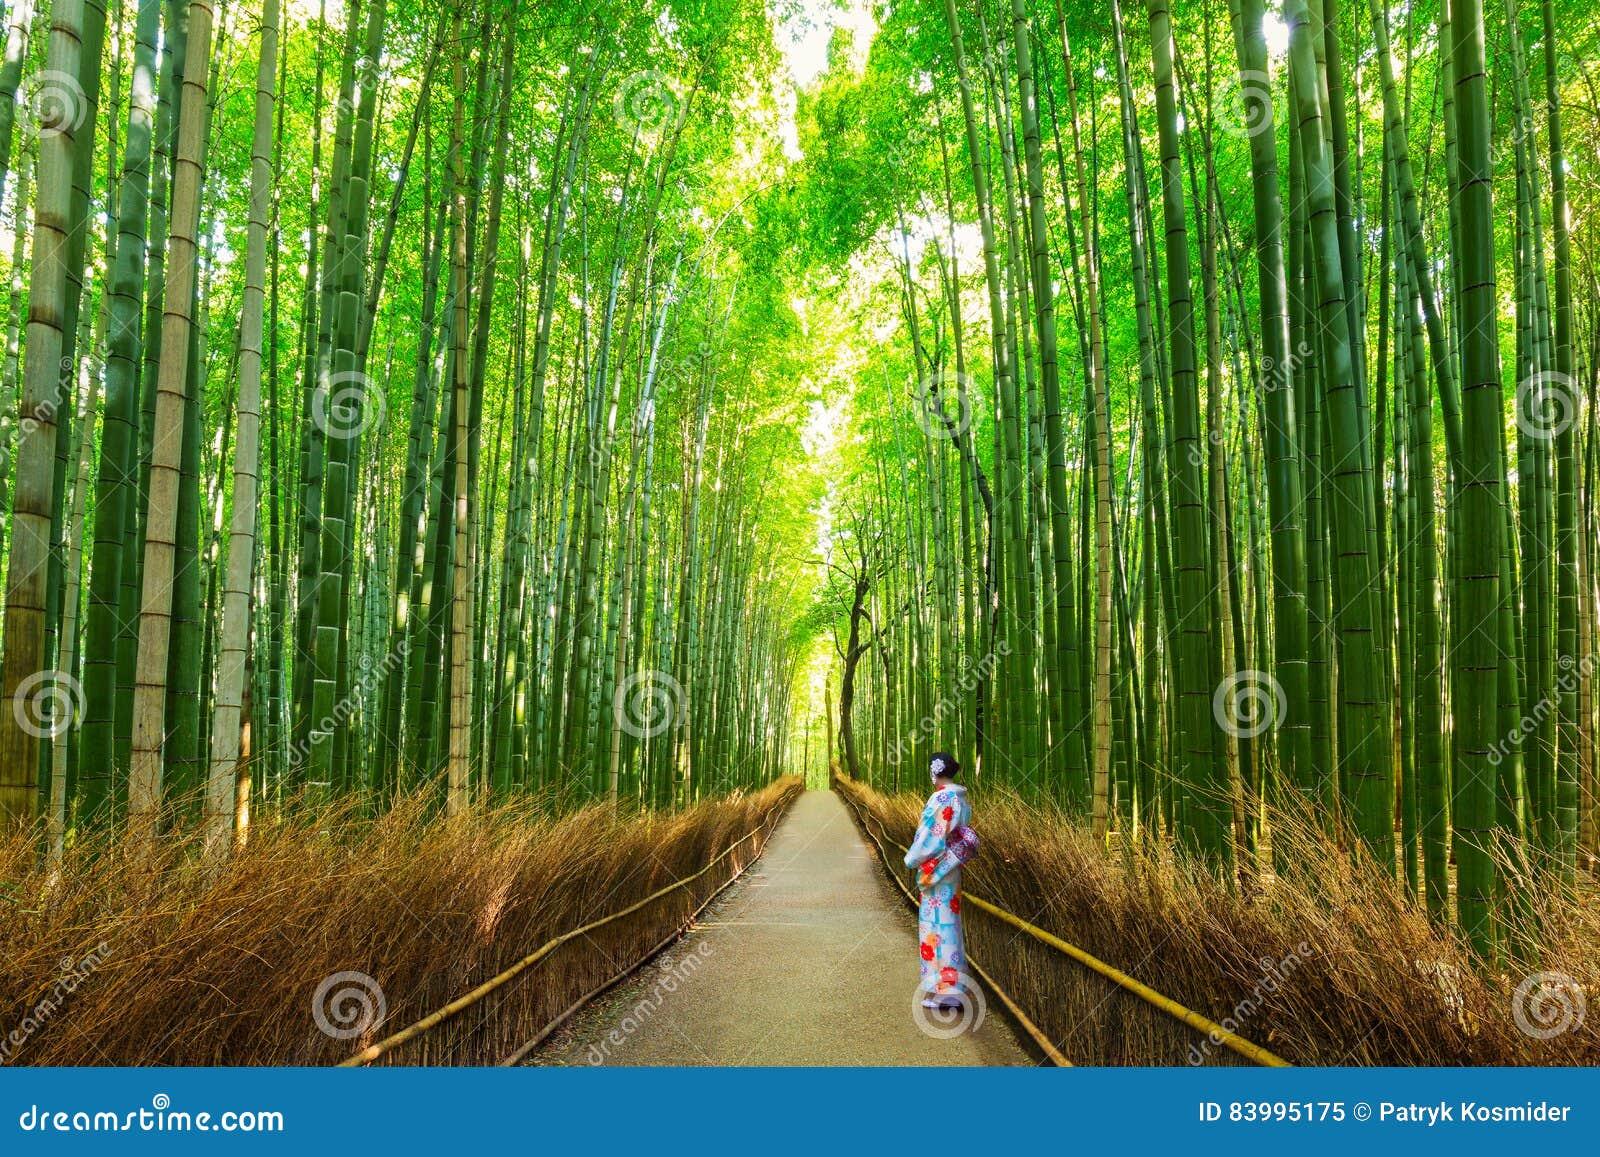 Bamboebos van Arashiyama dichtbij Kyoto, Japan